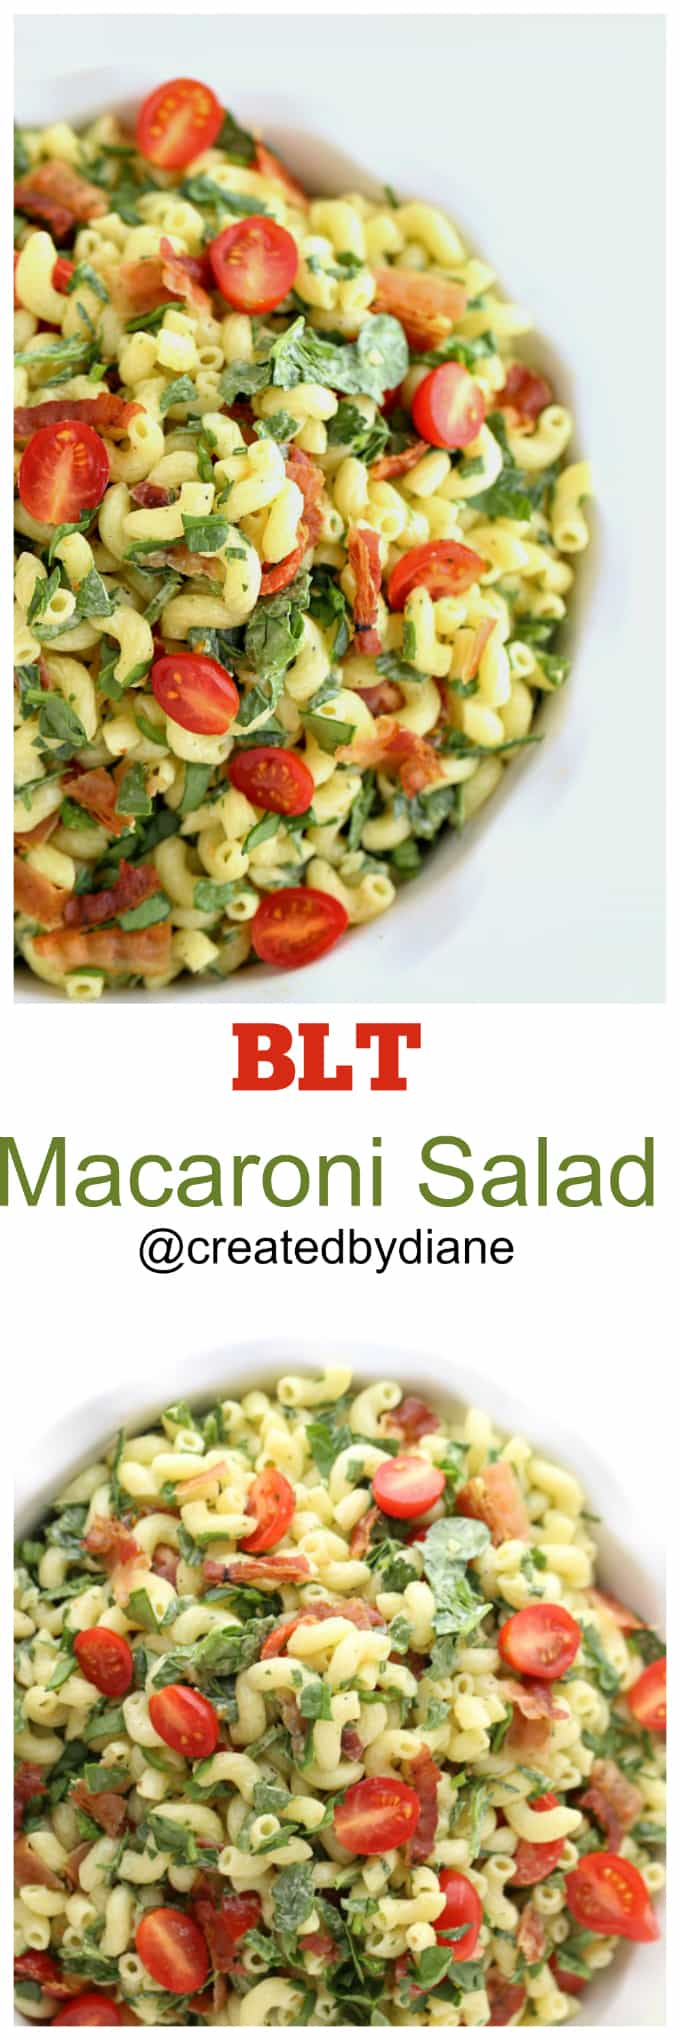 BLT Macaroni Salad recipe @createdbydiane